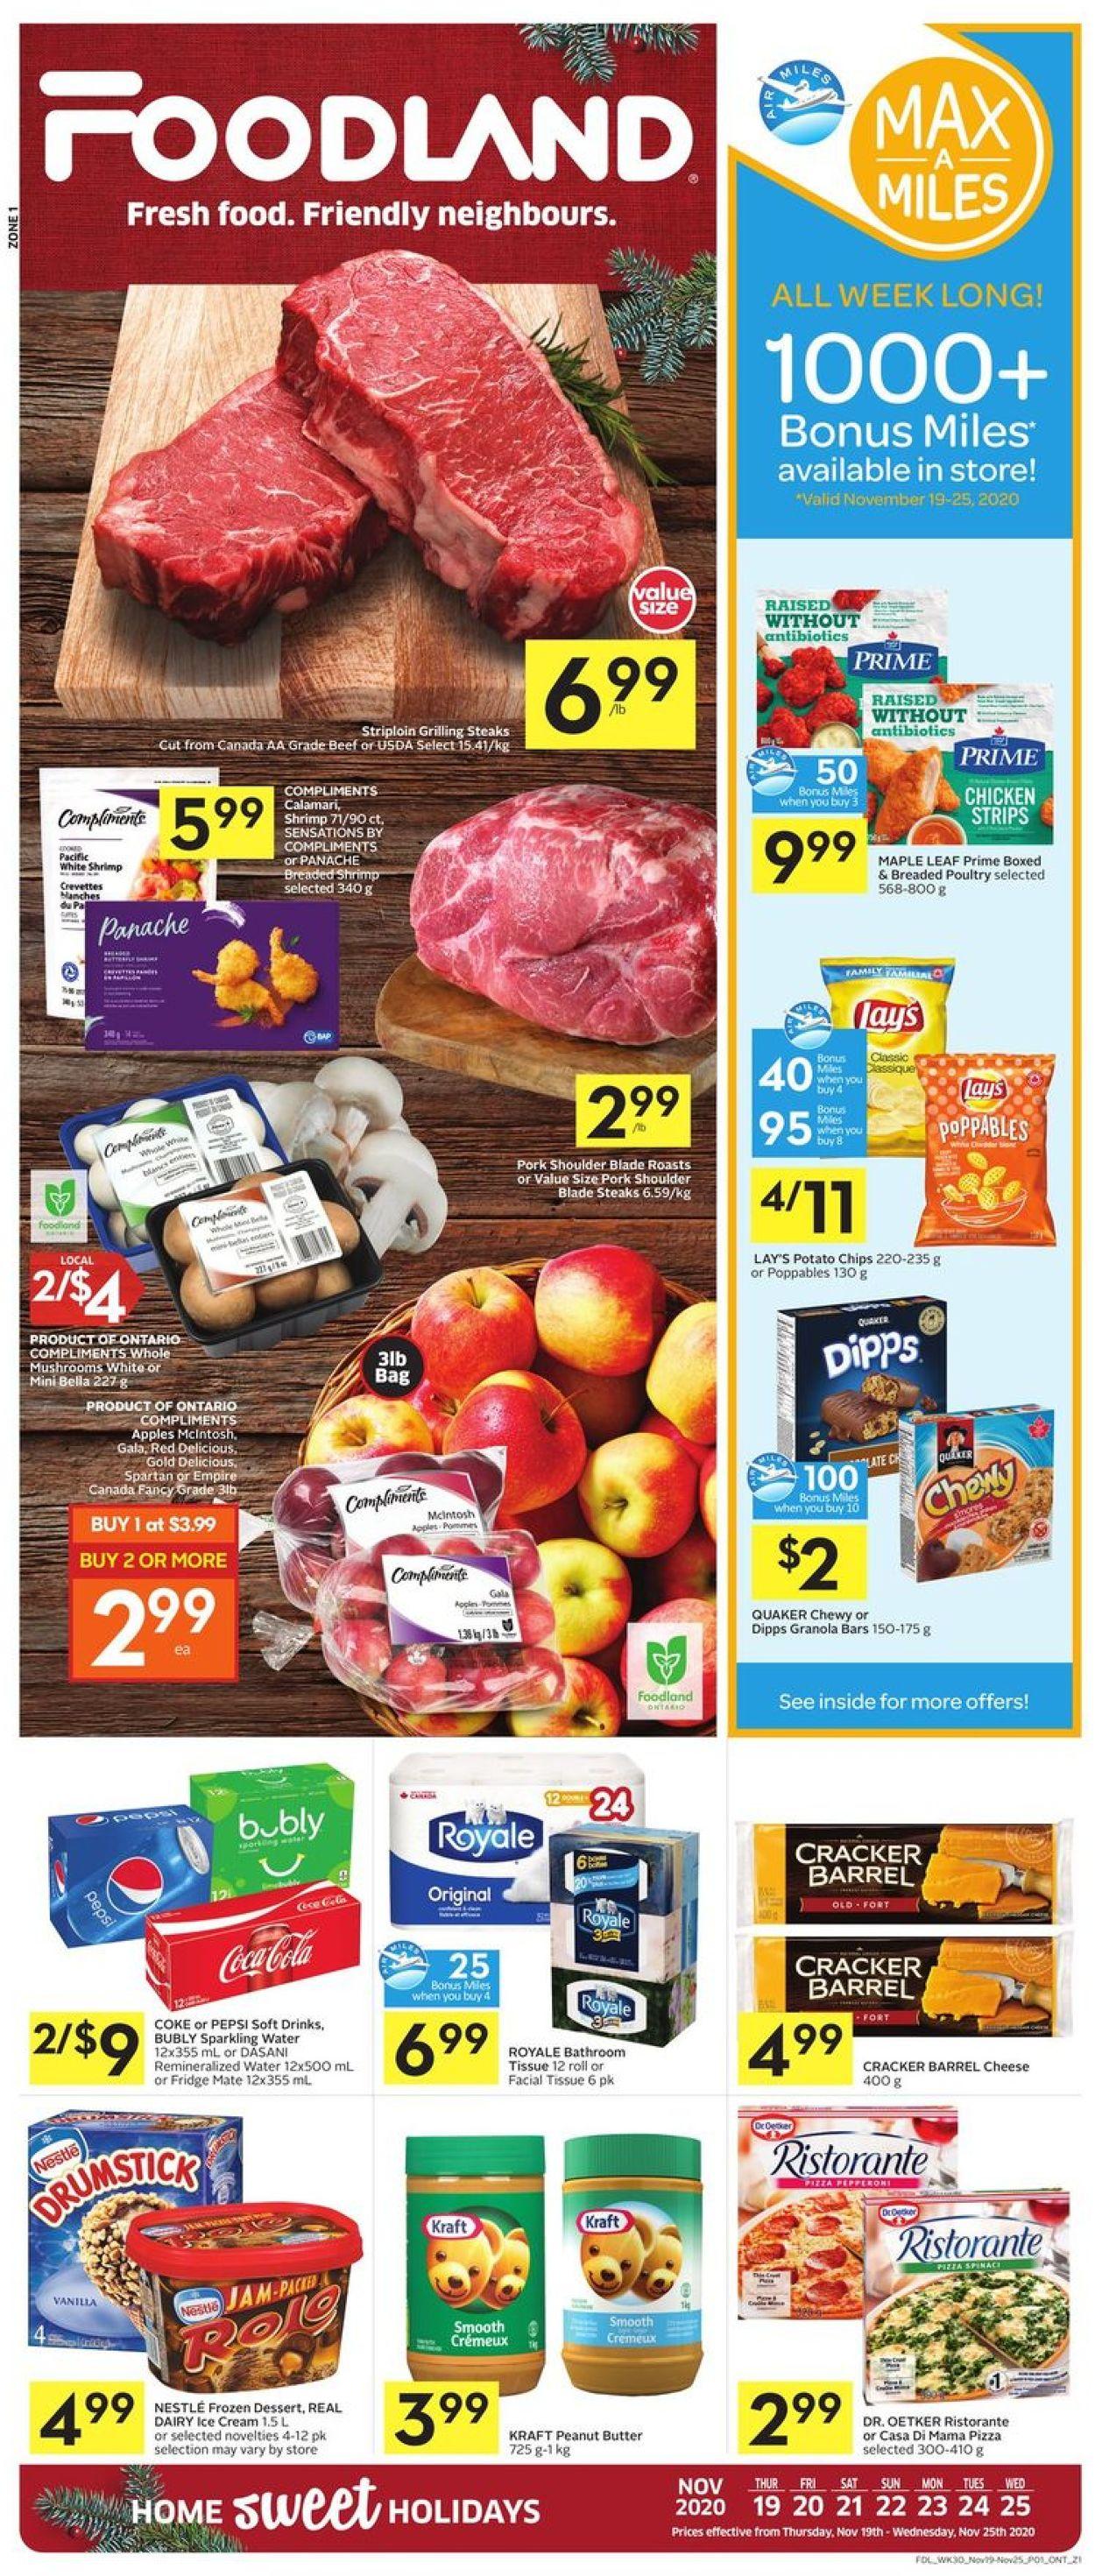 Foodland Flyer - 11/19-11/25/2020